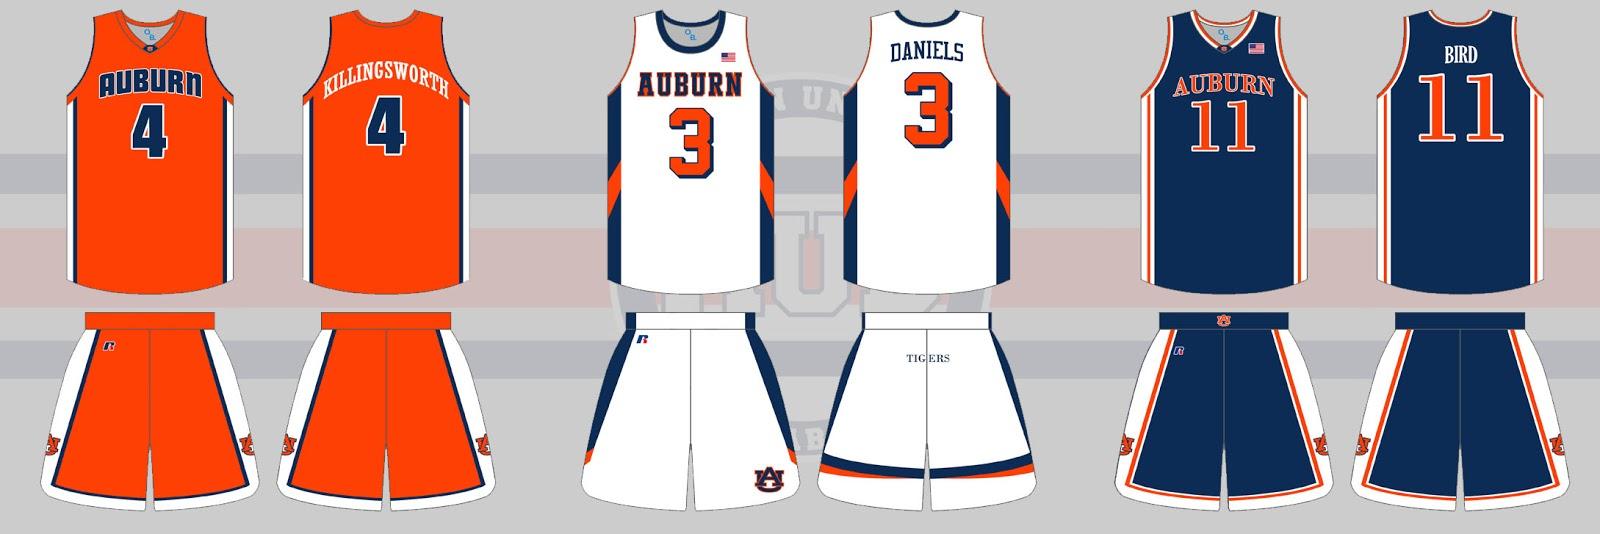 Auburn Uniform Database Basketball Uniforms